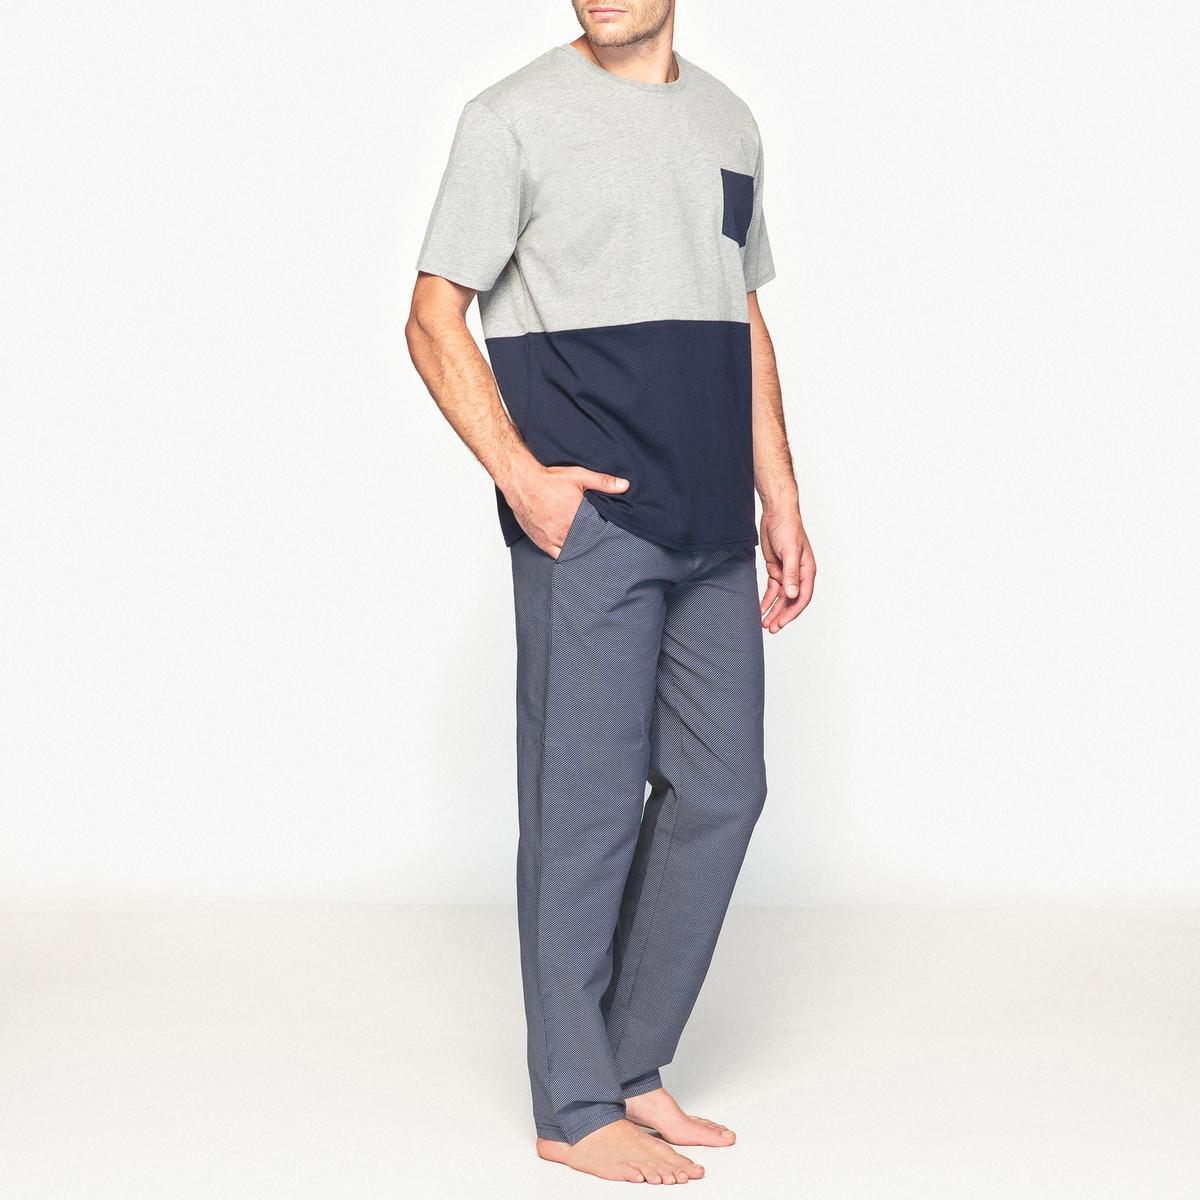 Pyjama| Oberteil kurzärmelig | Bekleidung > Wäsche | Blau | Baumwolle | La Redoute Collections